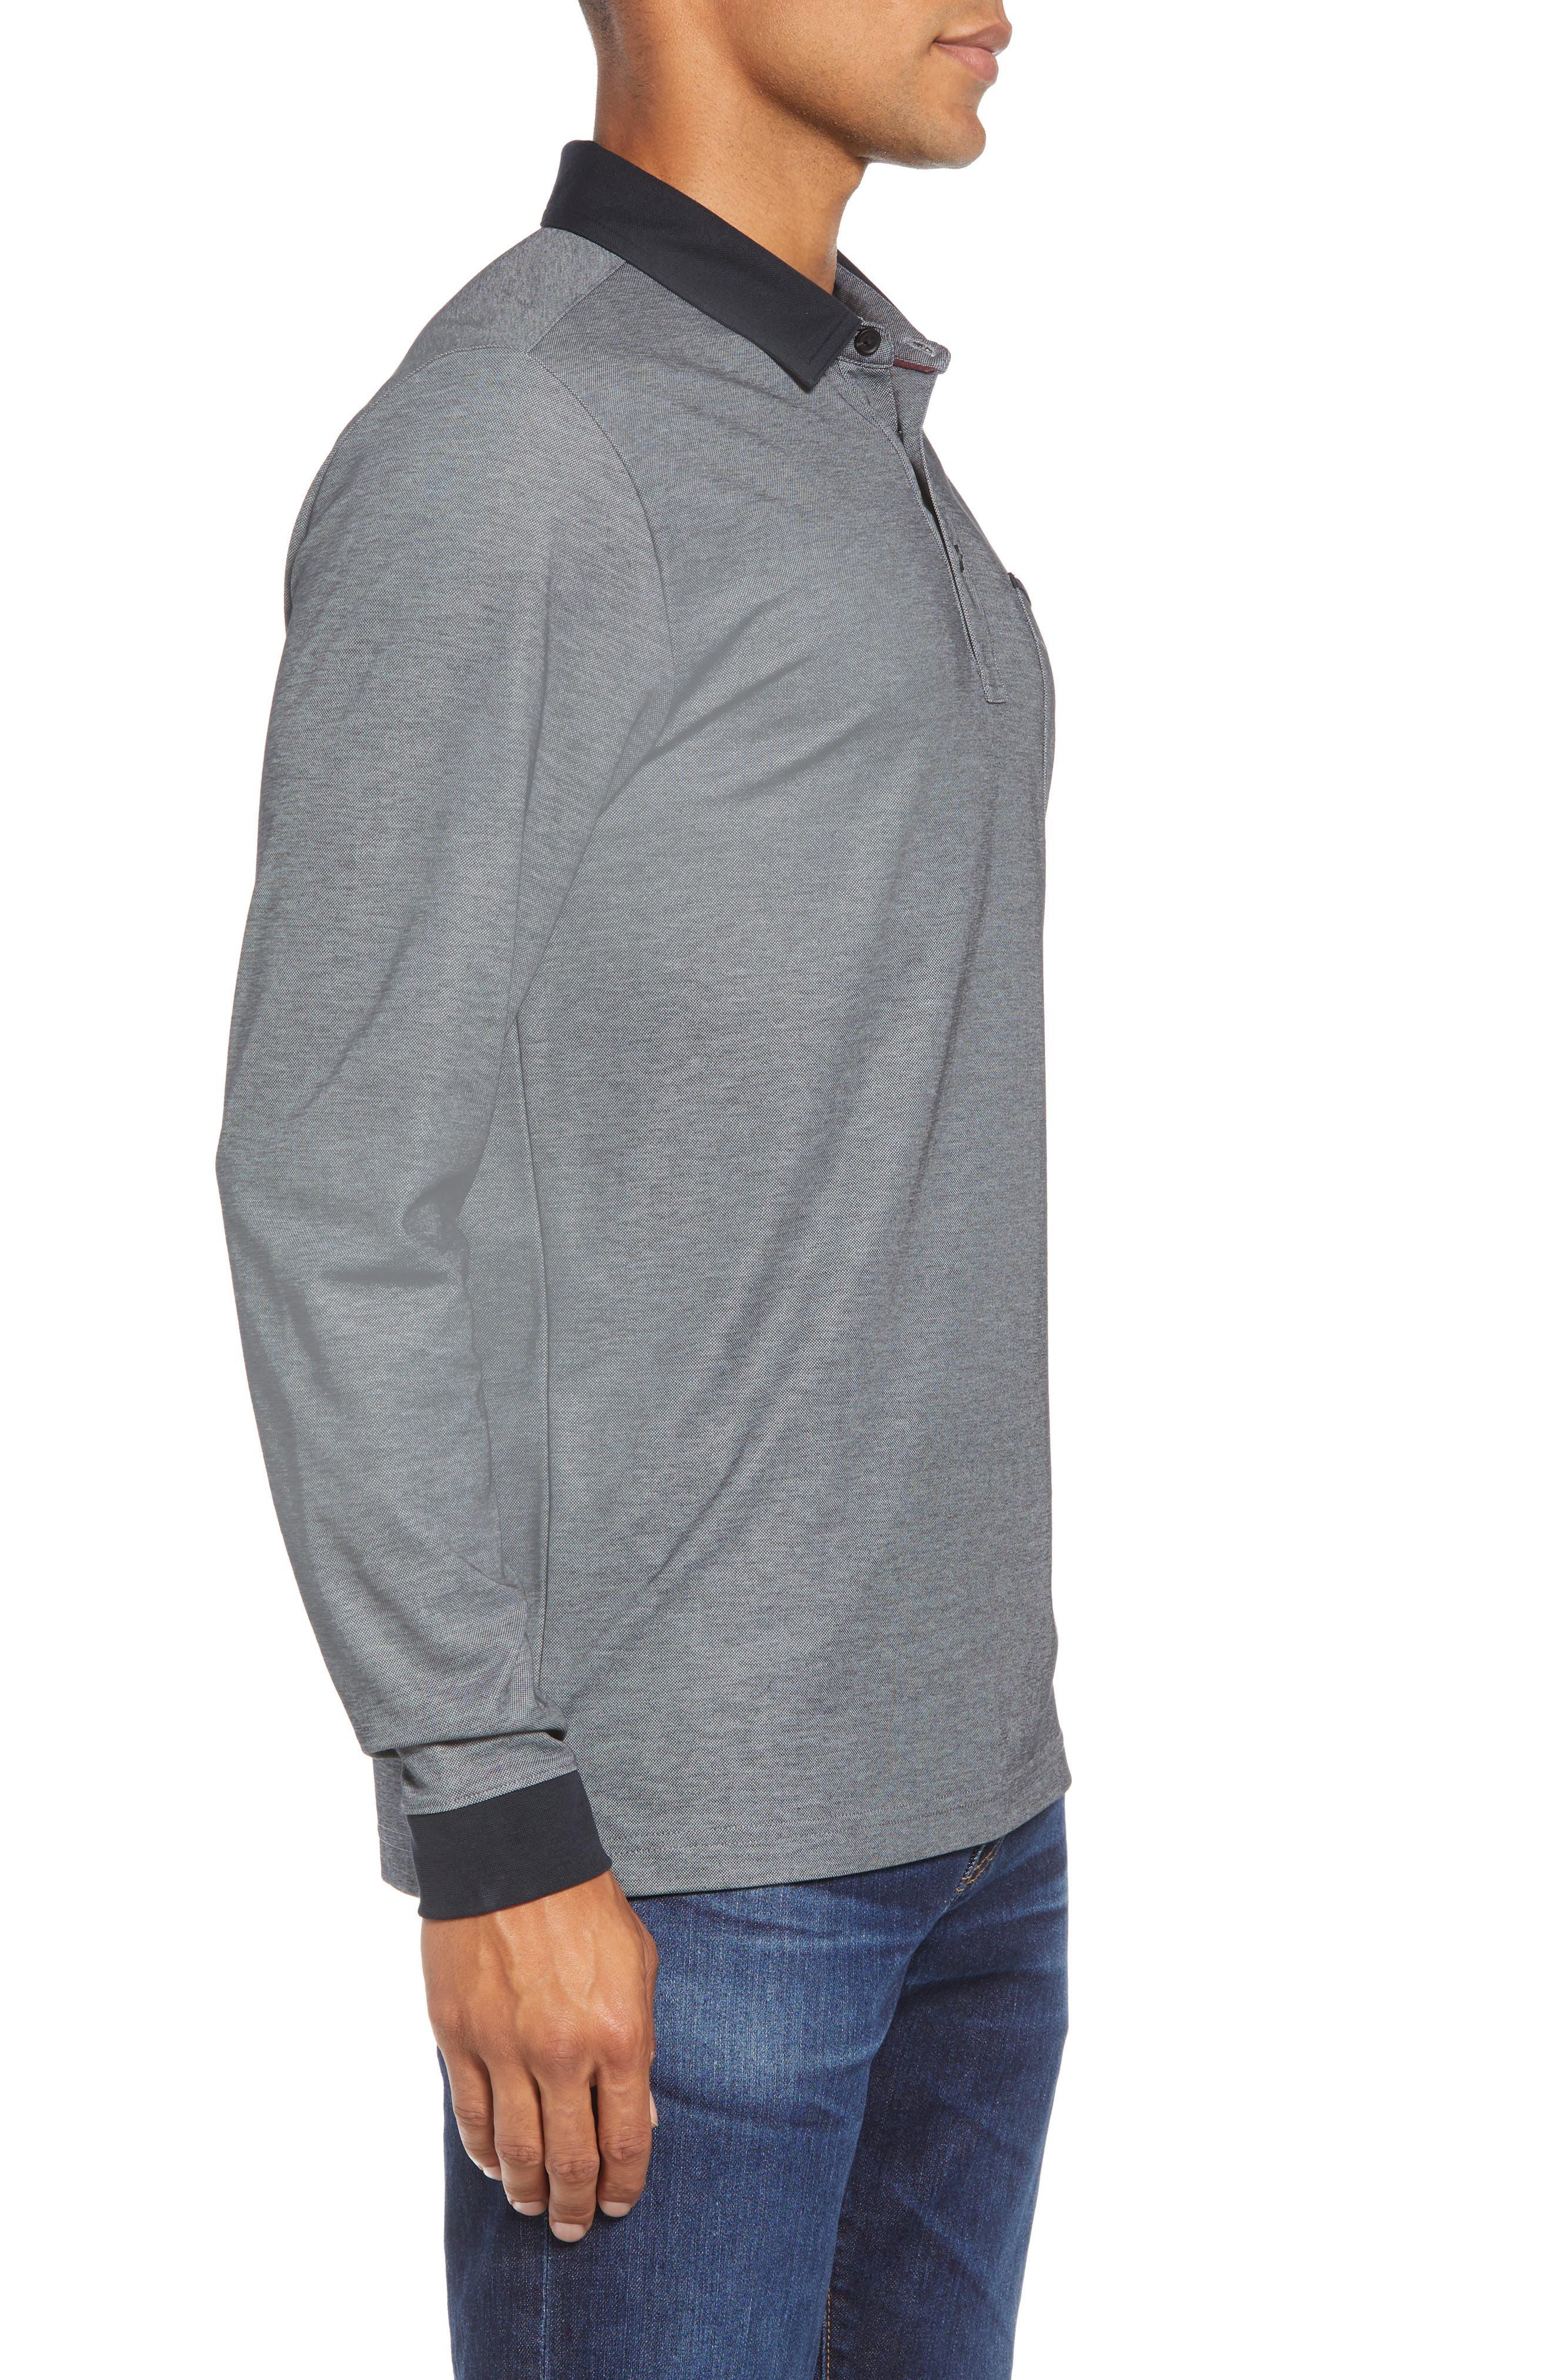 TRAVIS MATHEW,                             Kay Regular Fit Long Sleeve Polo Shirt,                             Alternate thumbnail 3, color,                             020